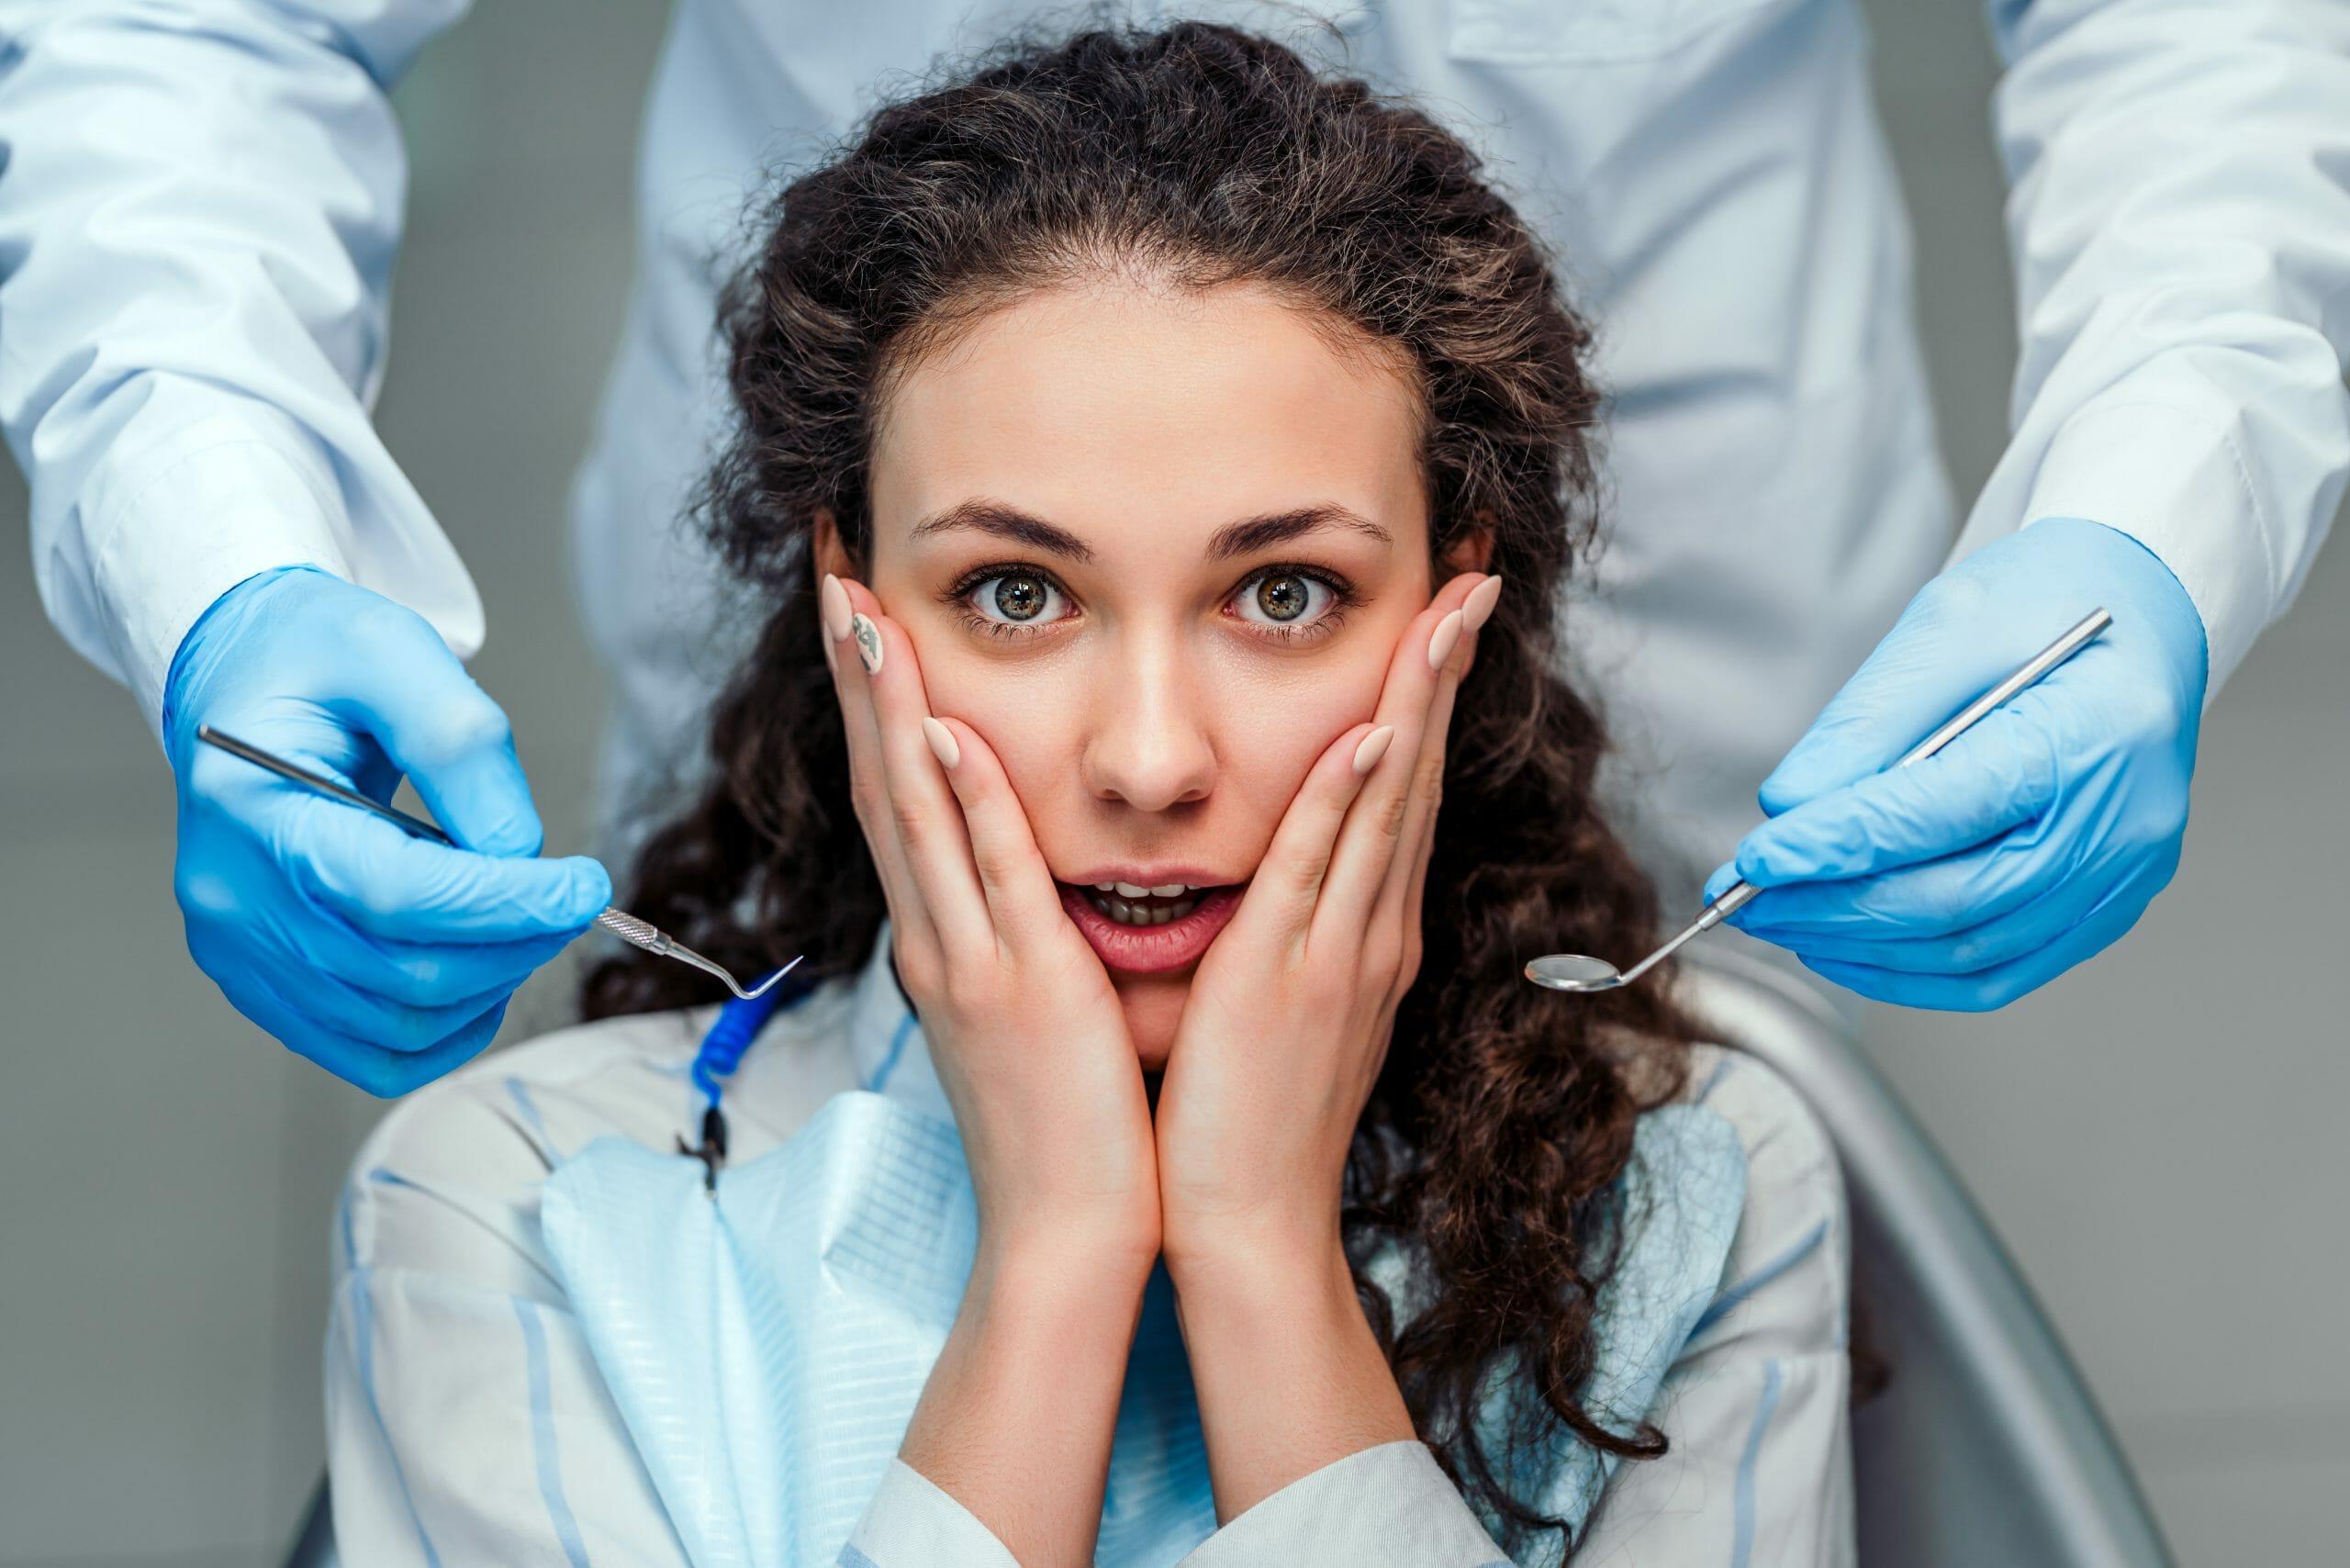 Dentist with Gum Stimulator and Mirror in hand